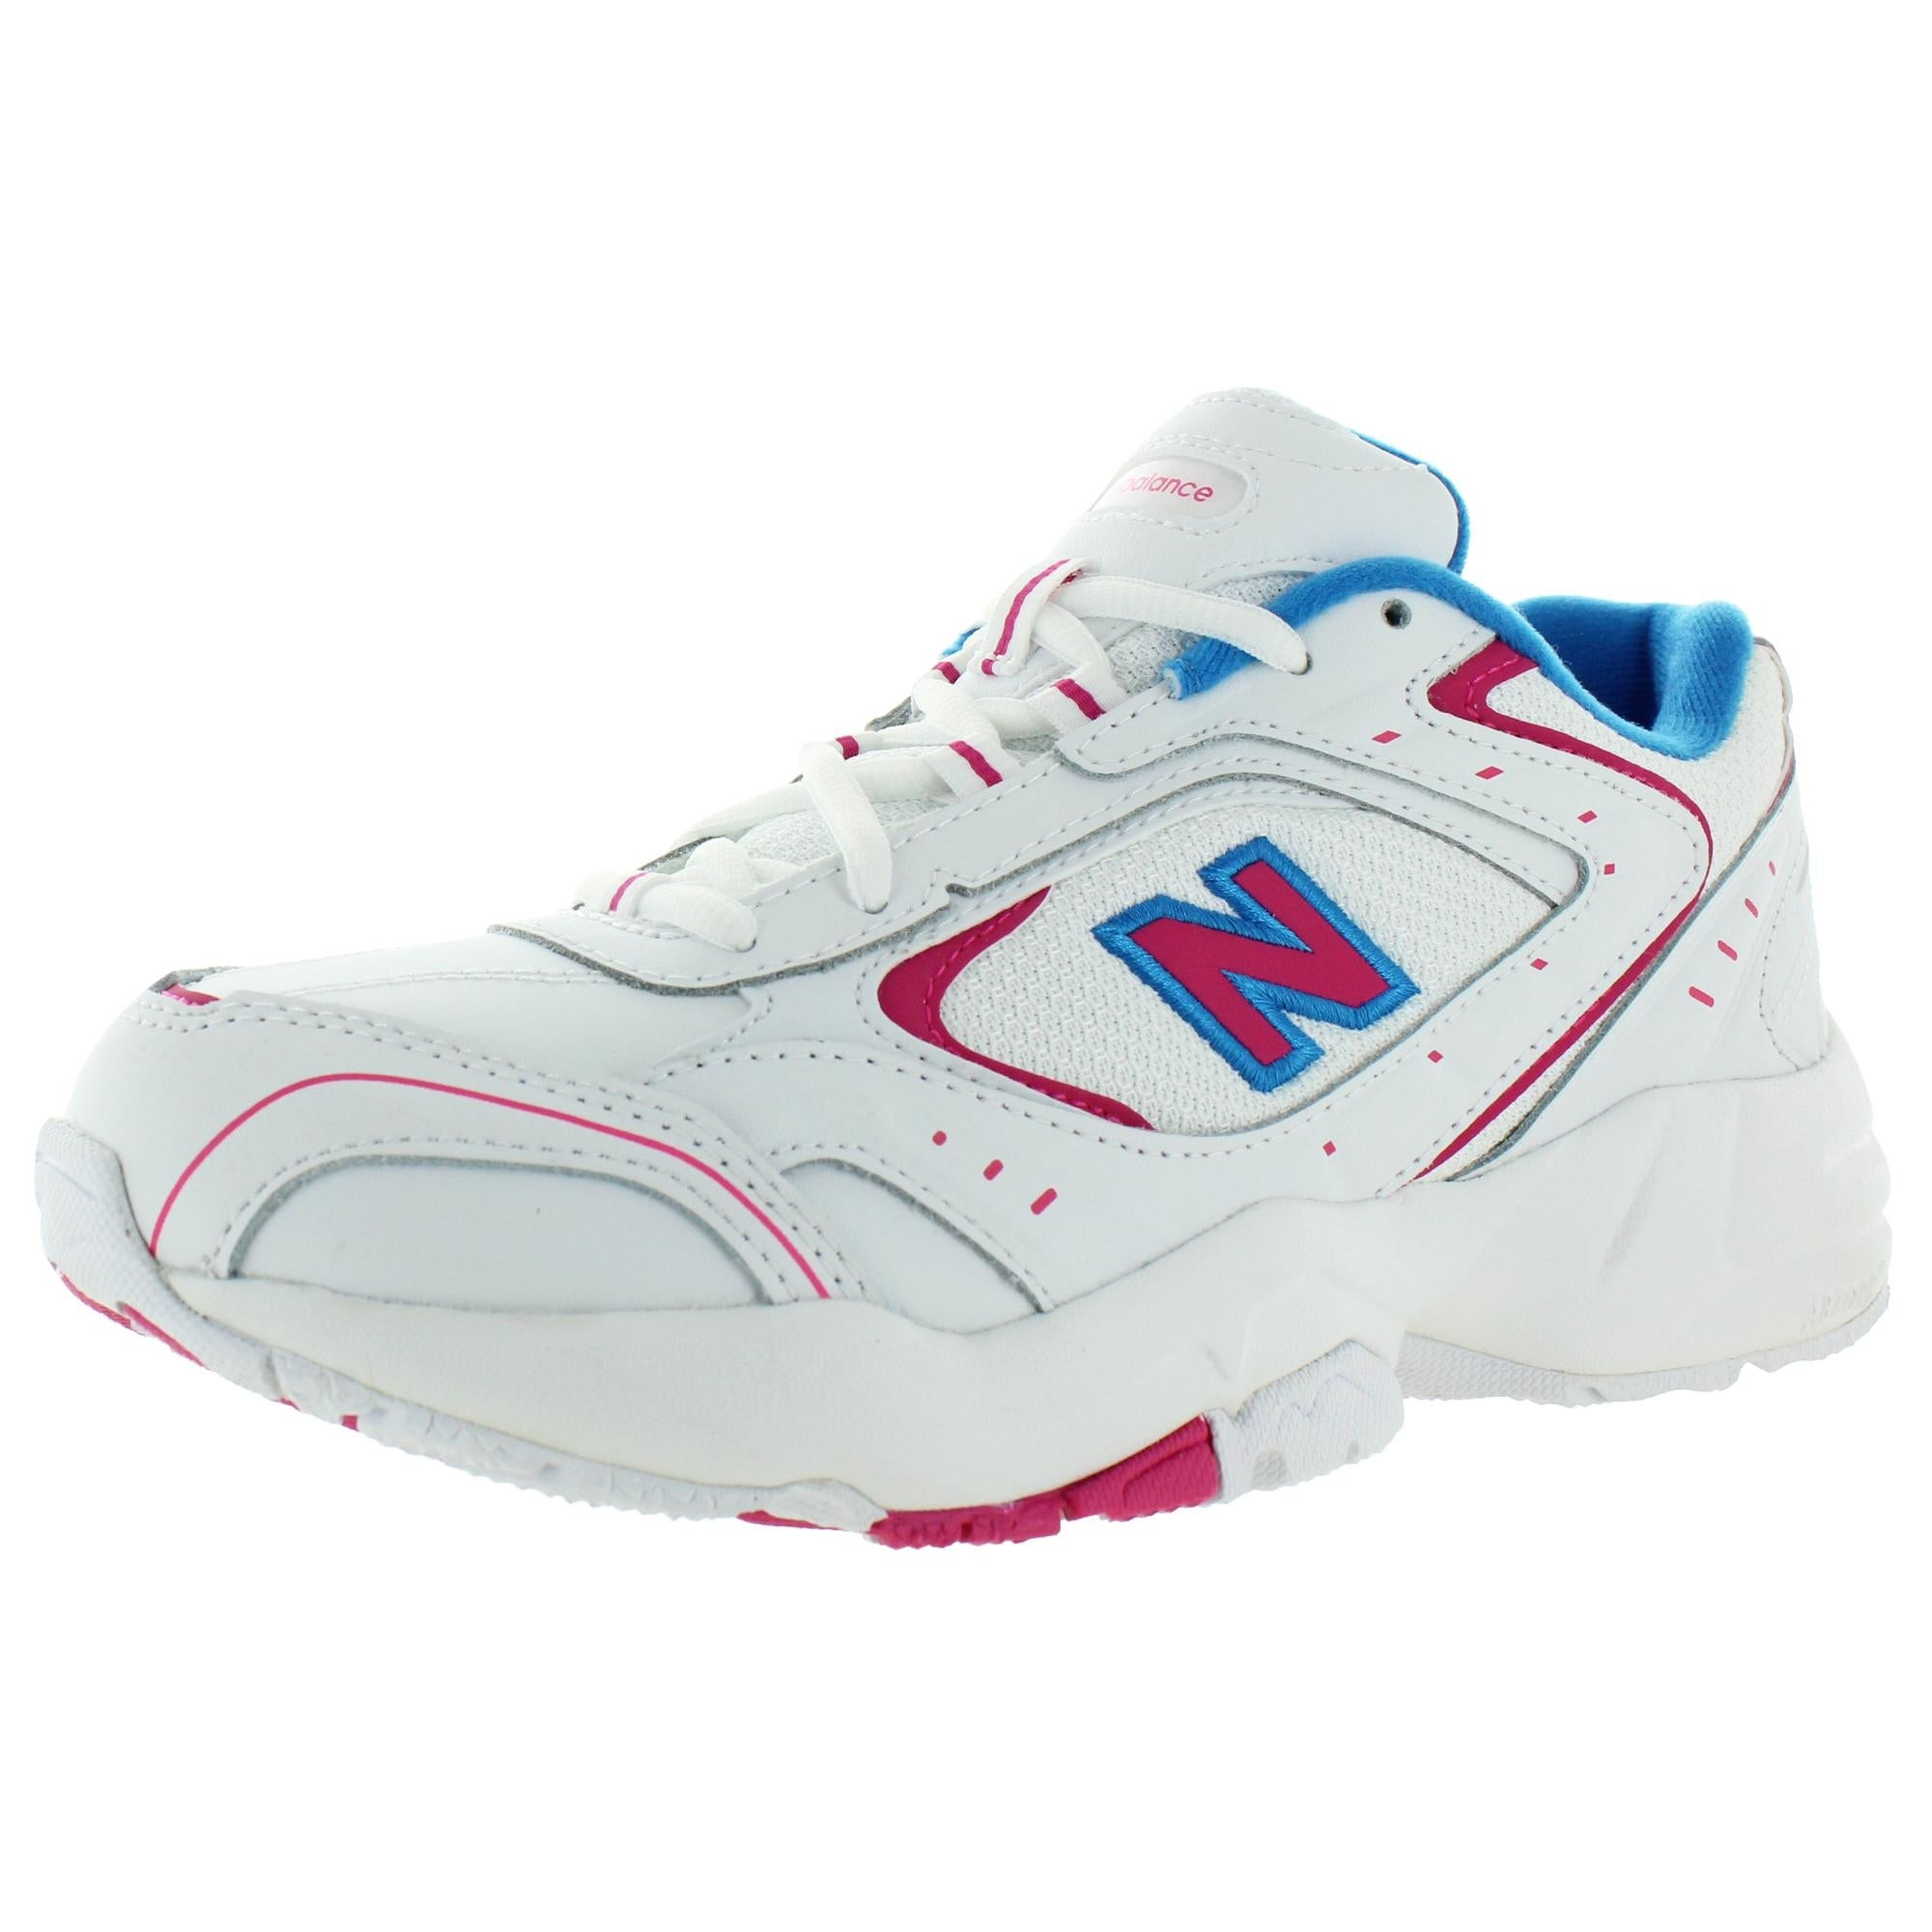 Shop New Balance Mens 452 Running